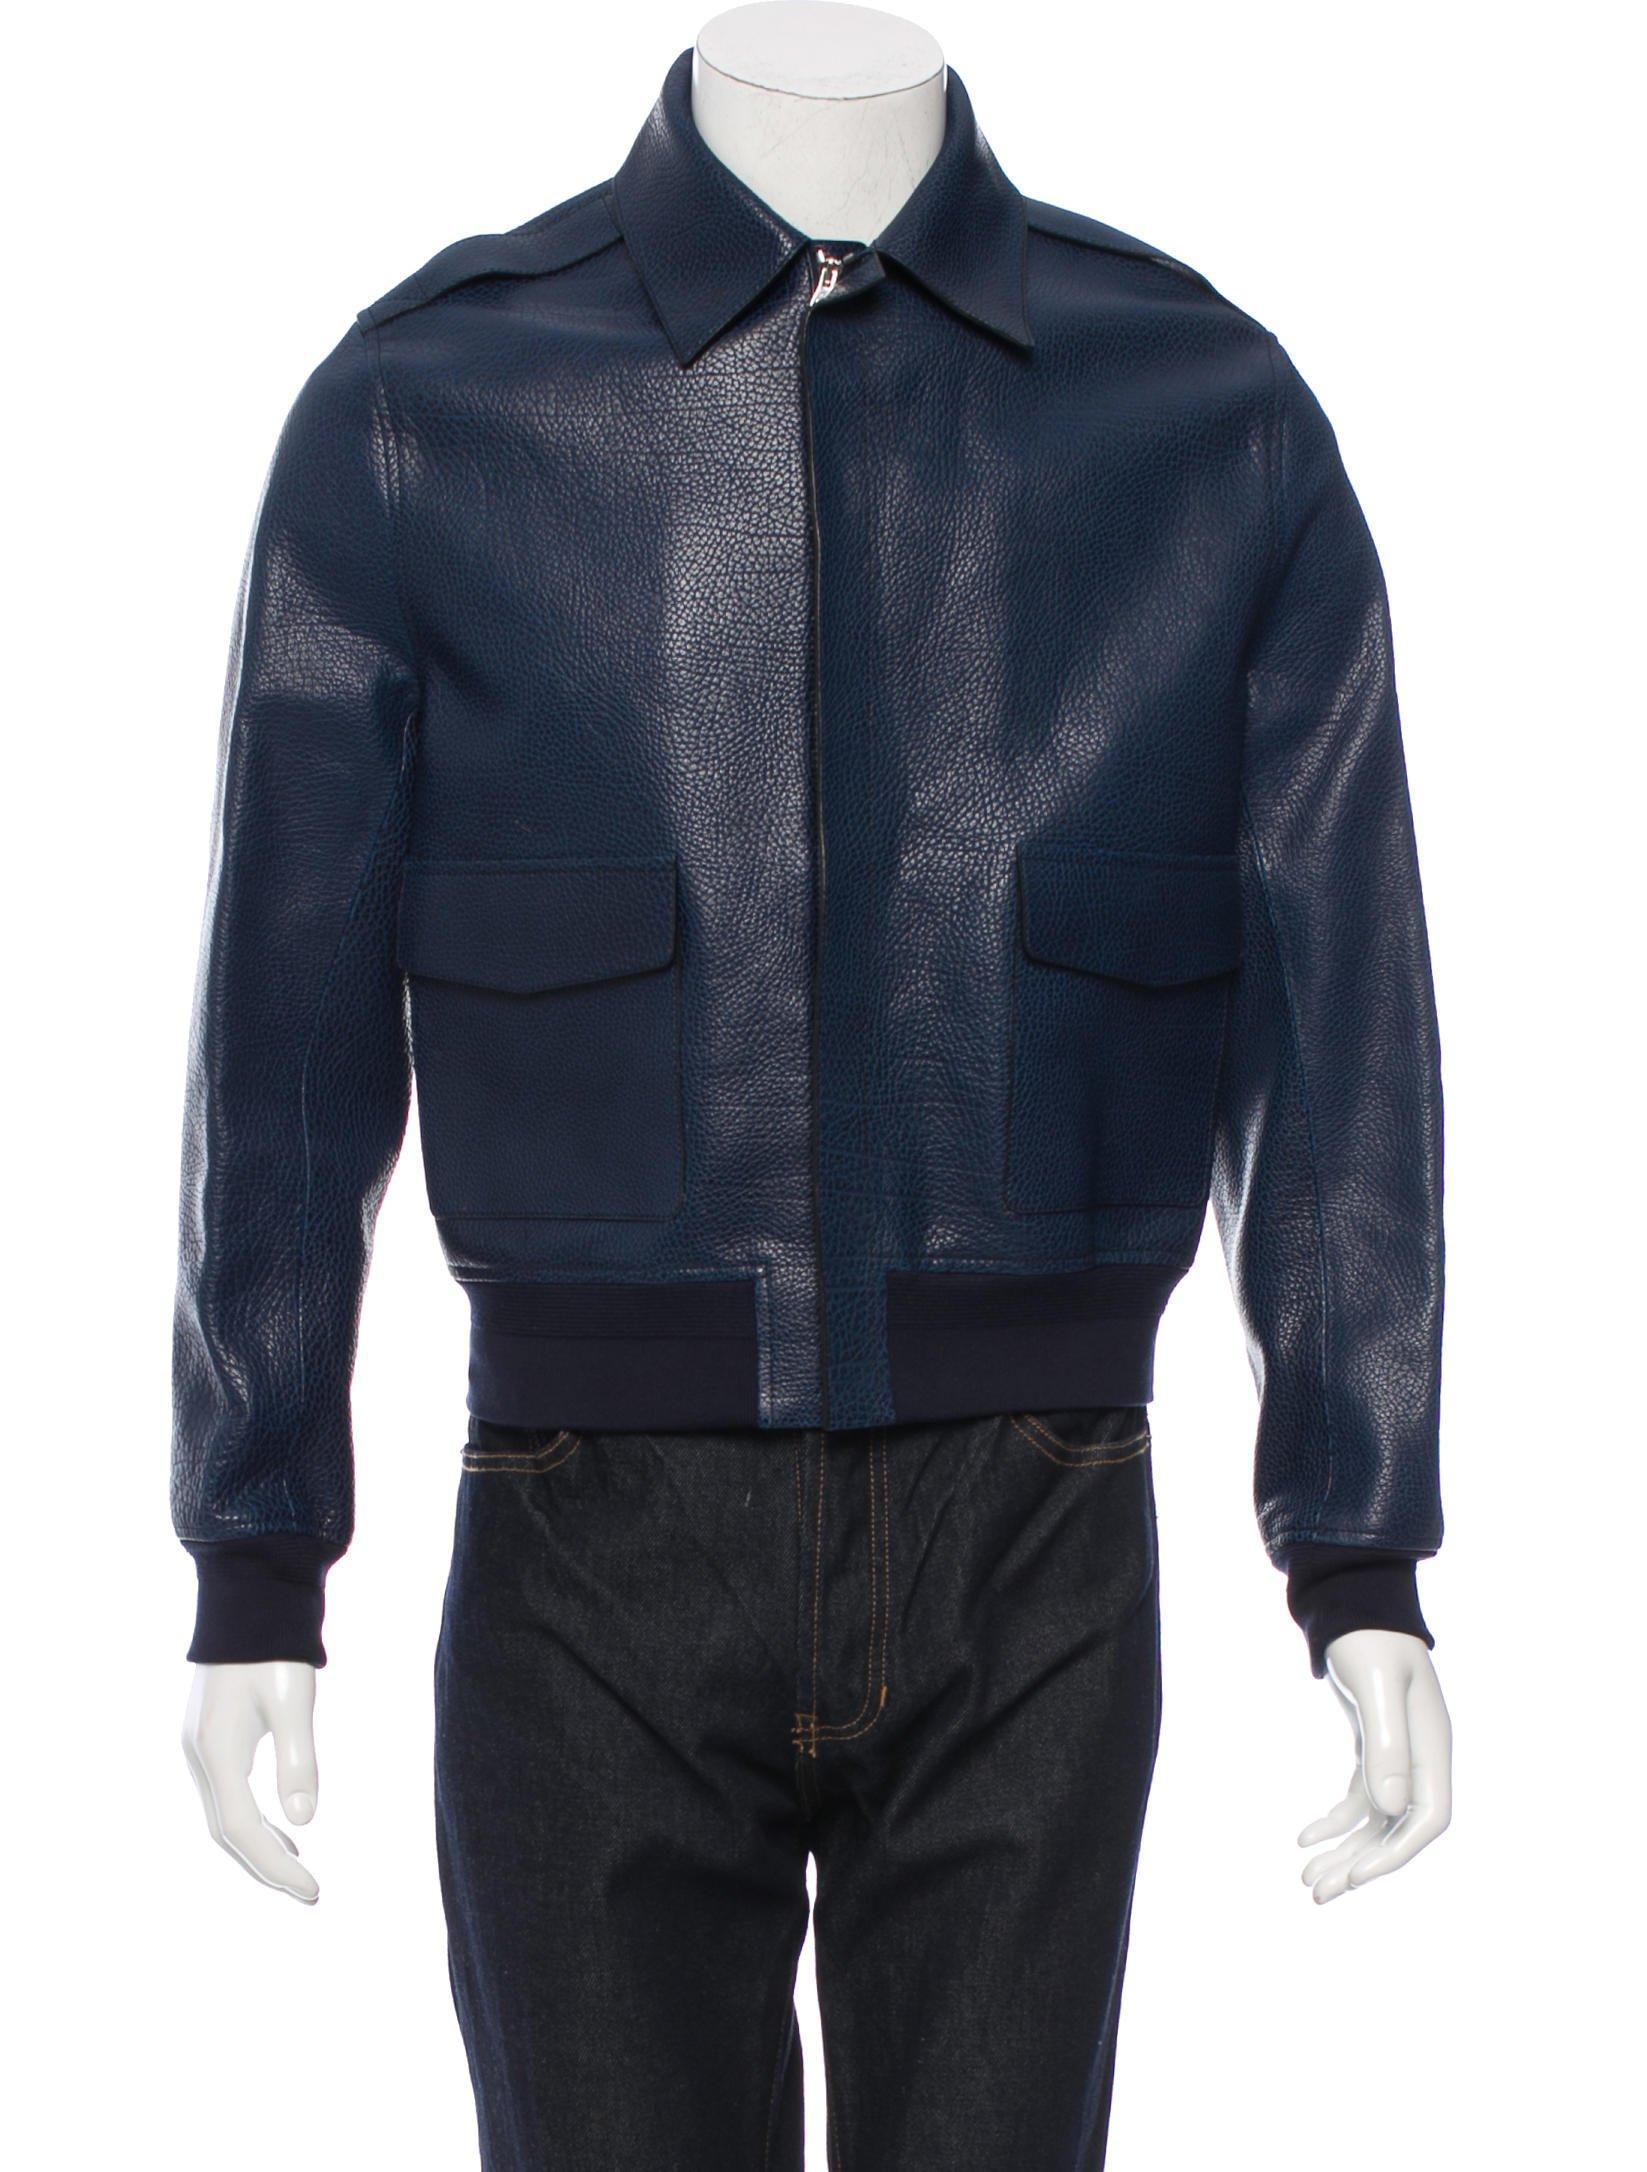 Louis vuitton leather jackets